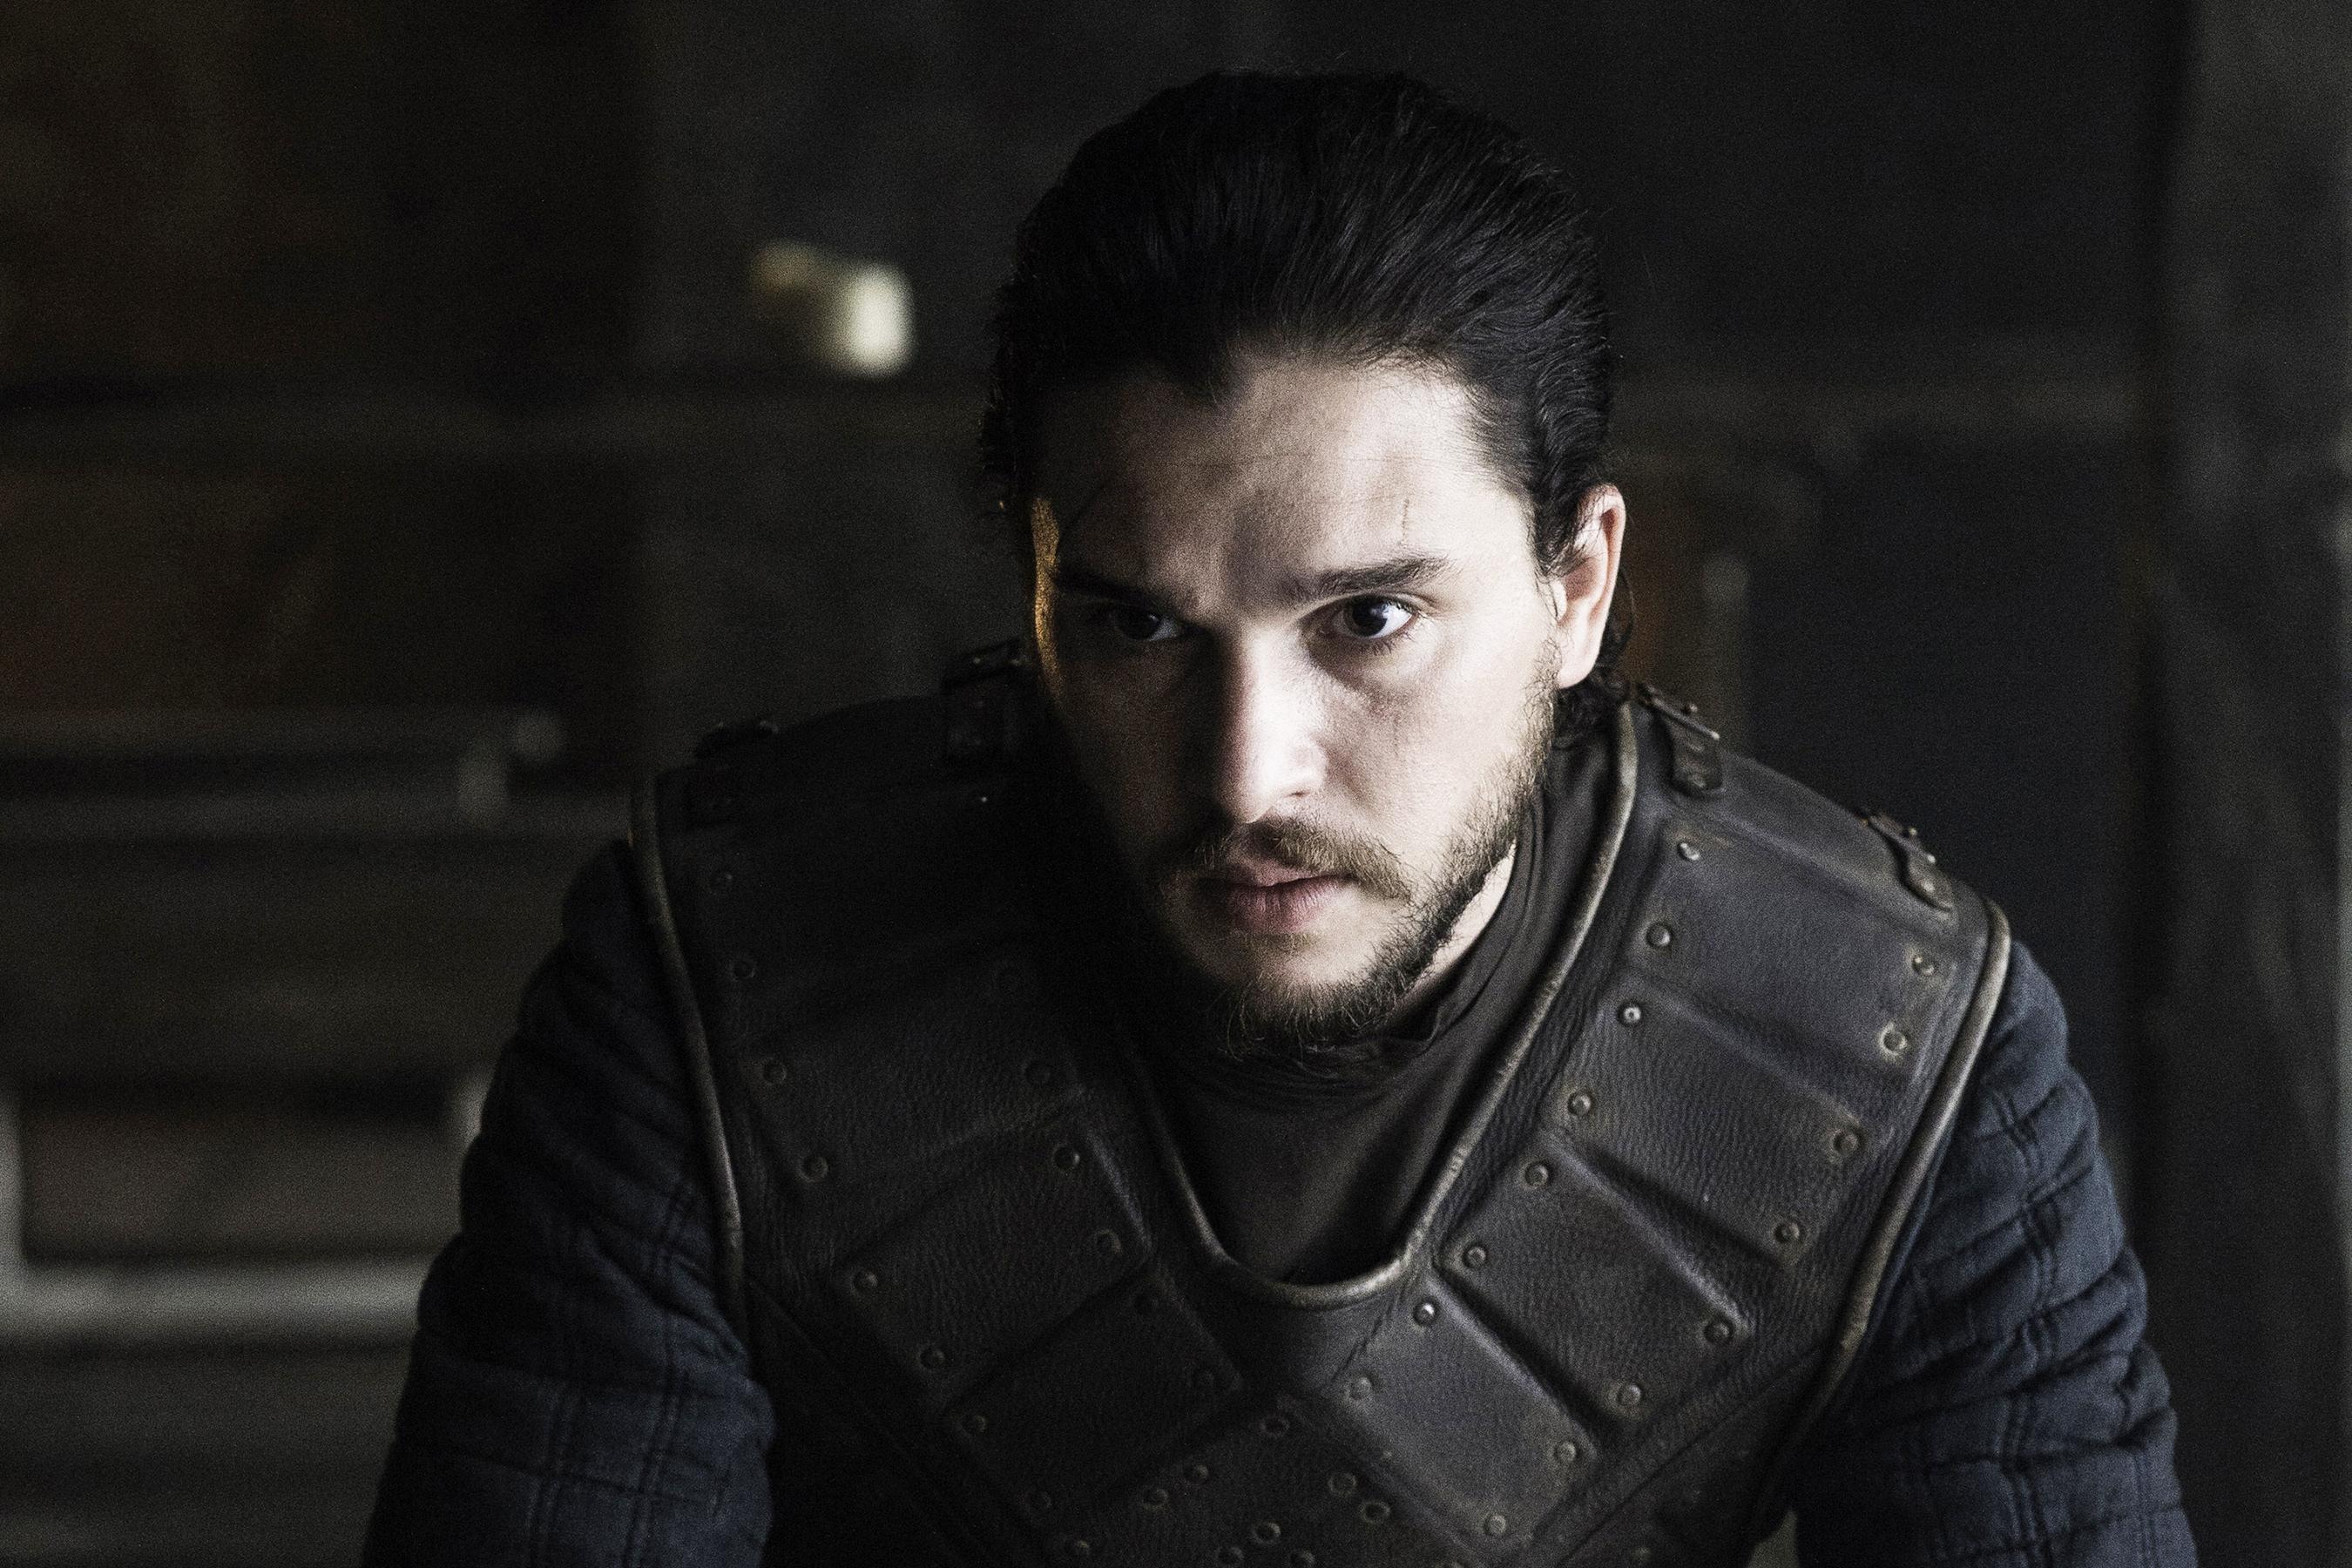 Kit Harington in Game of Thrones, season 6, episode 5.